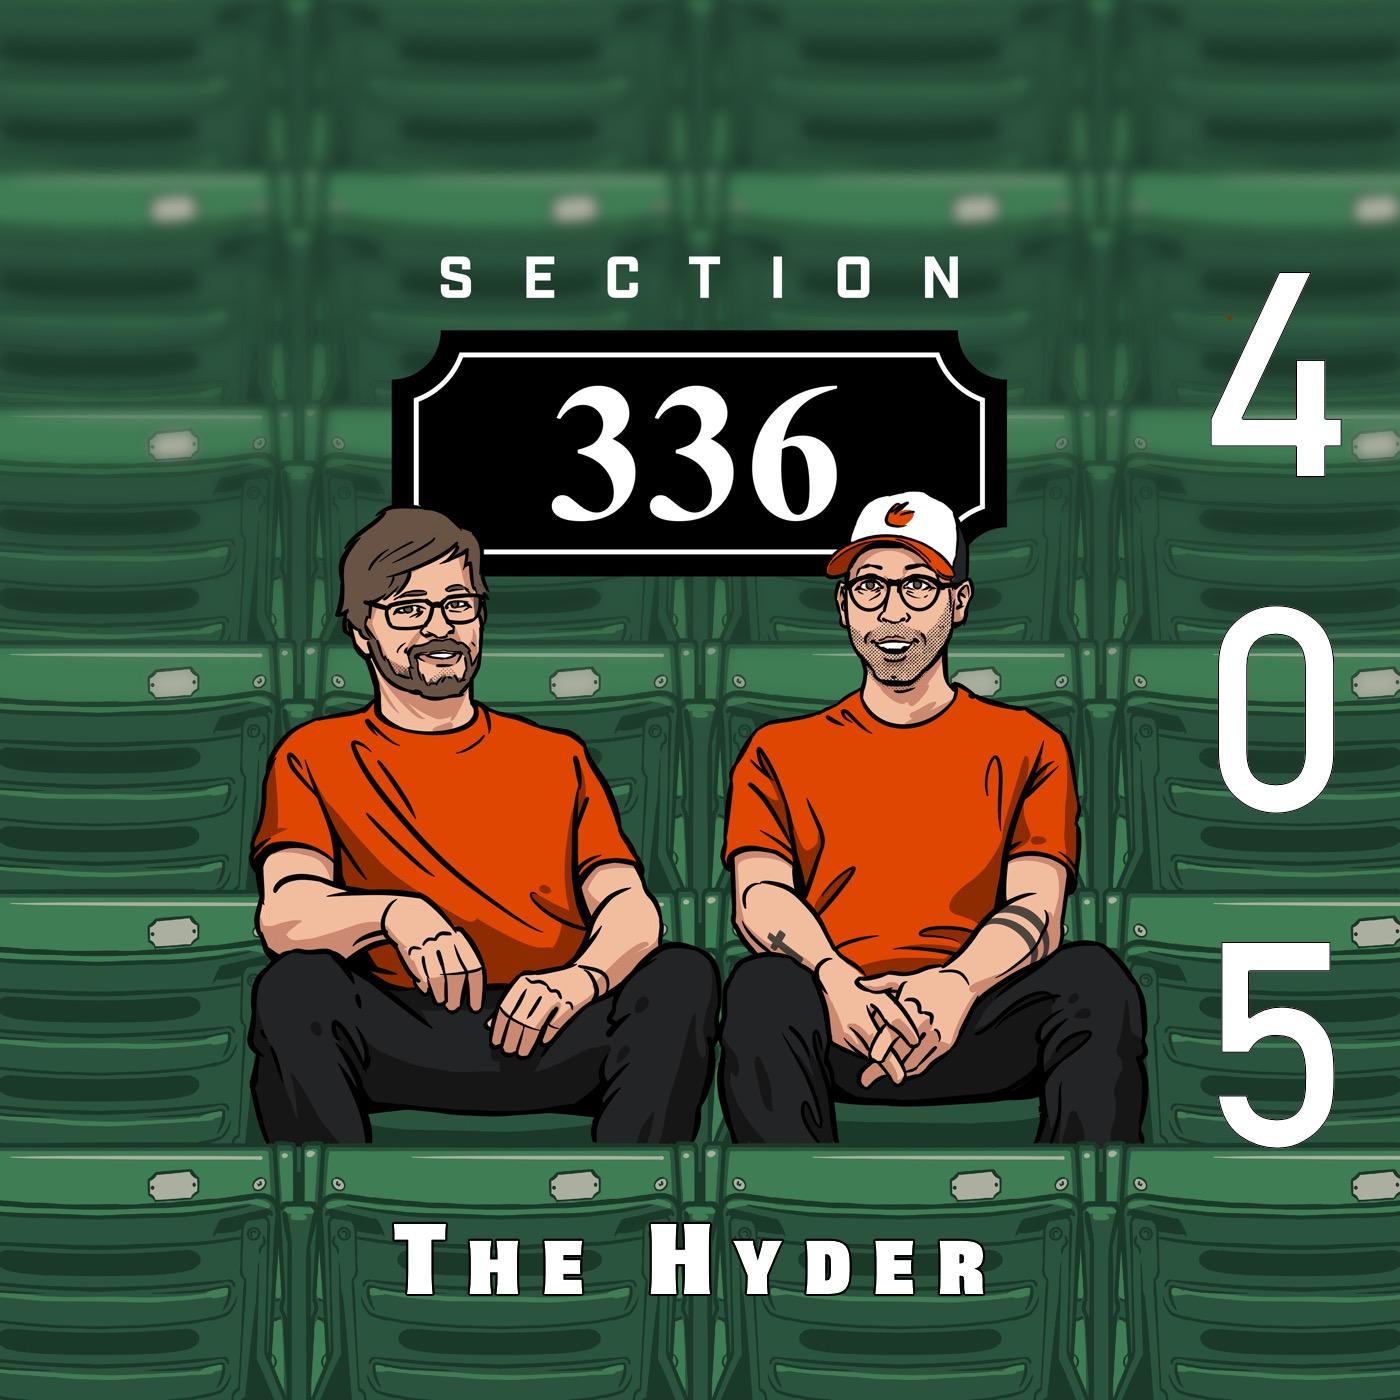 Pod 405 : The Hyder